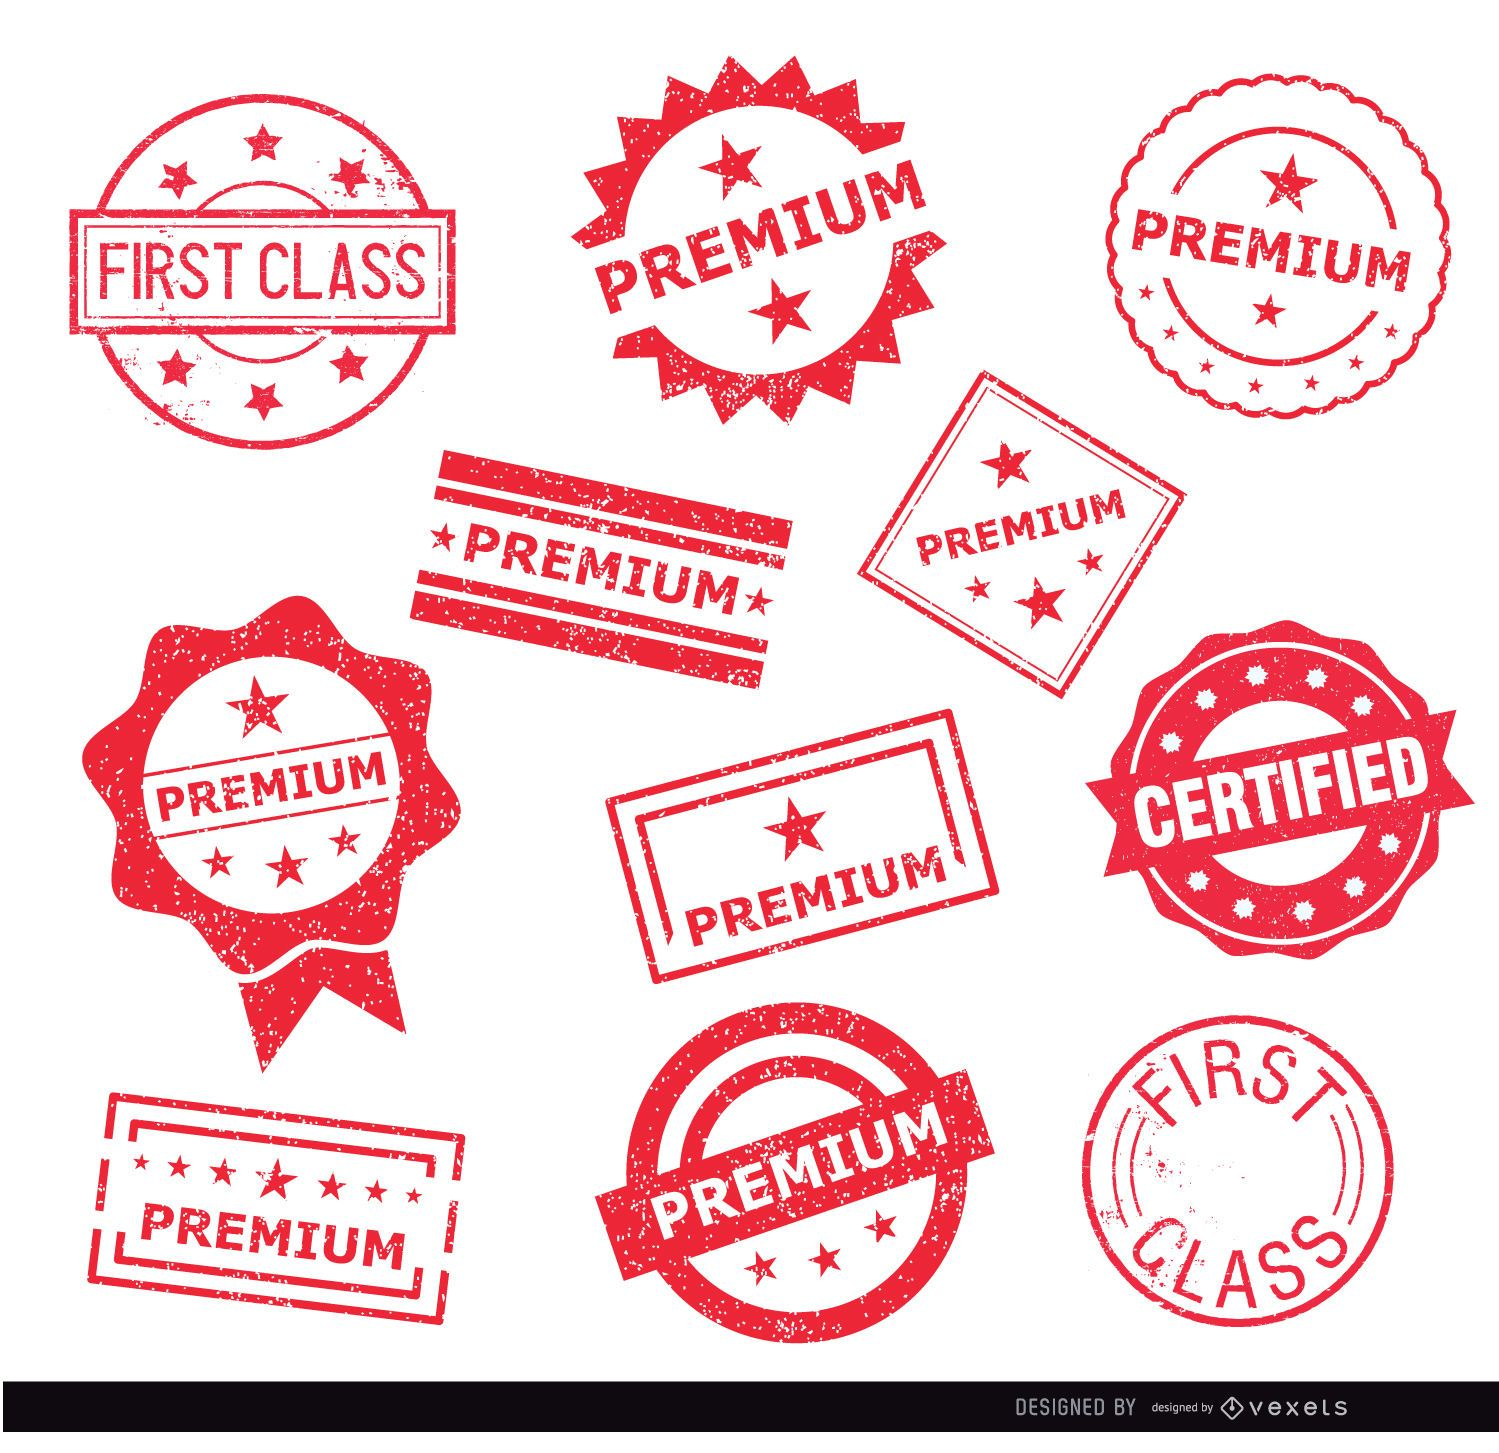 11 sellos de sello premium